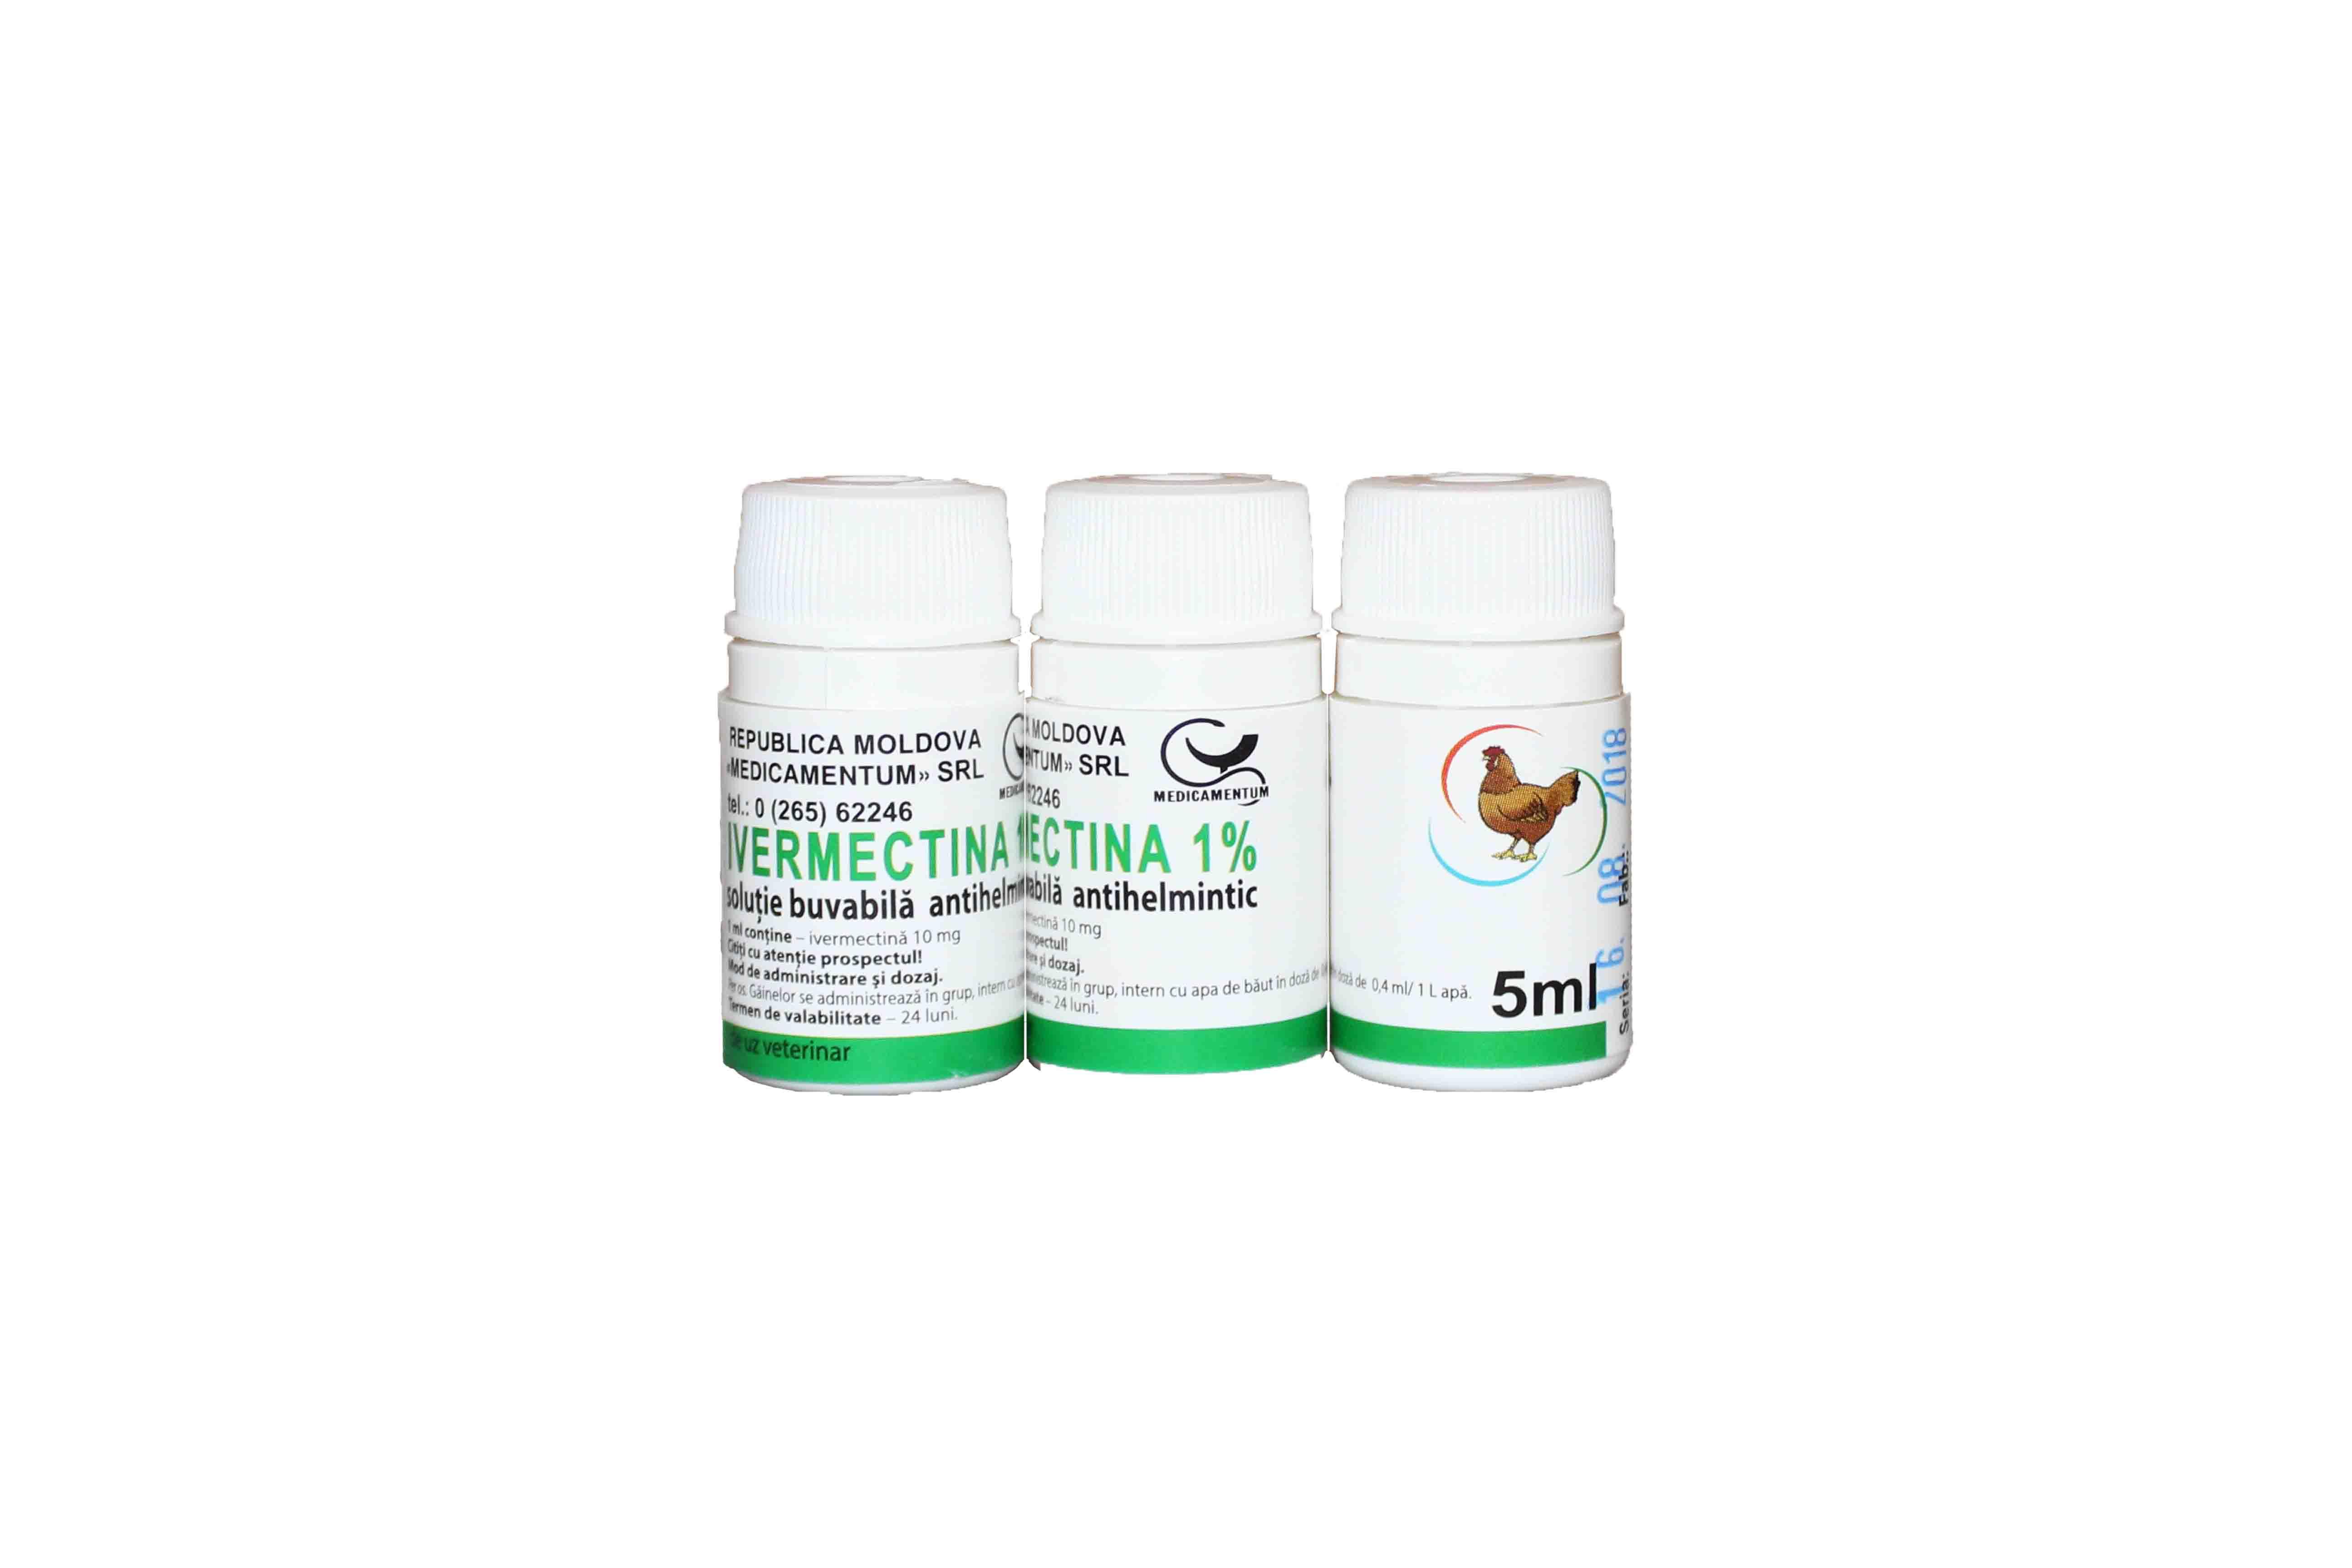 medicamente profilactice antihelmintice)